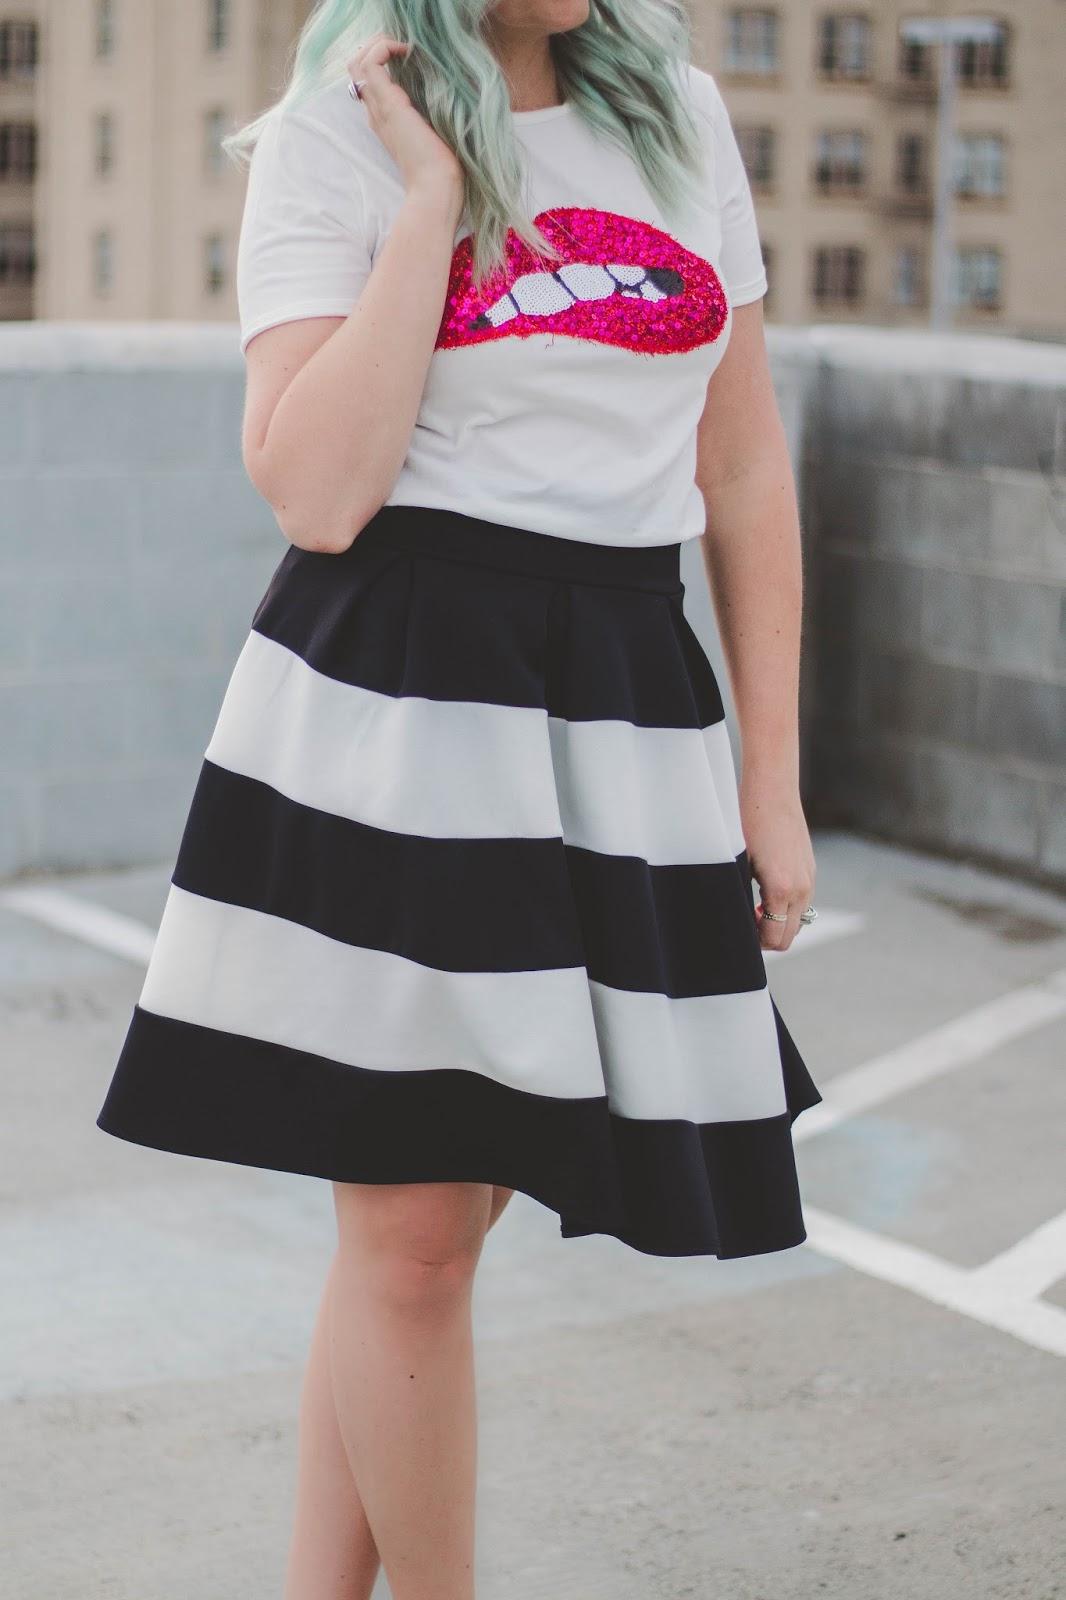 Lips Shirt, Striped Skirt, Utah Fashion Blogger